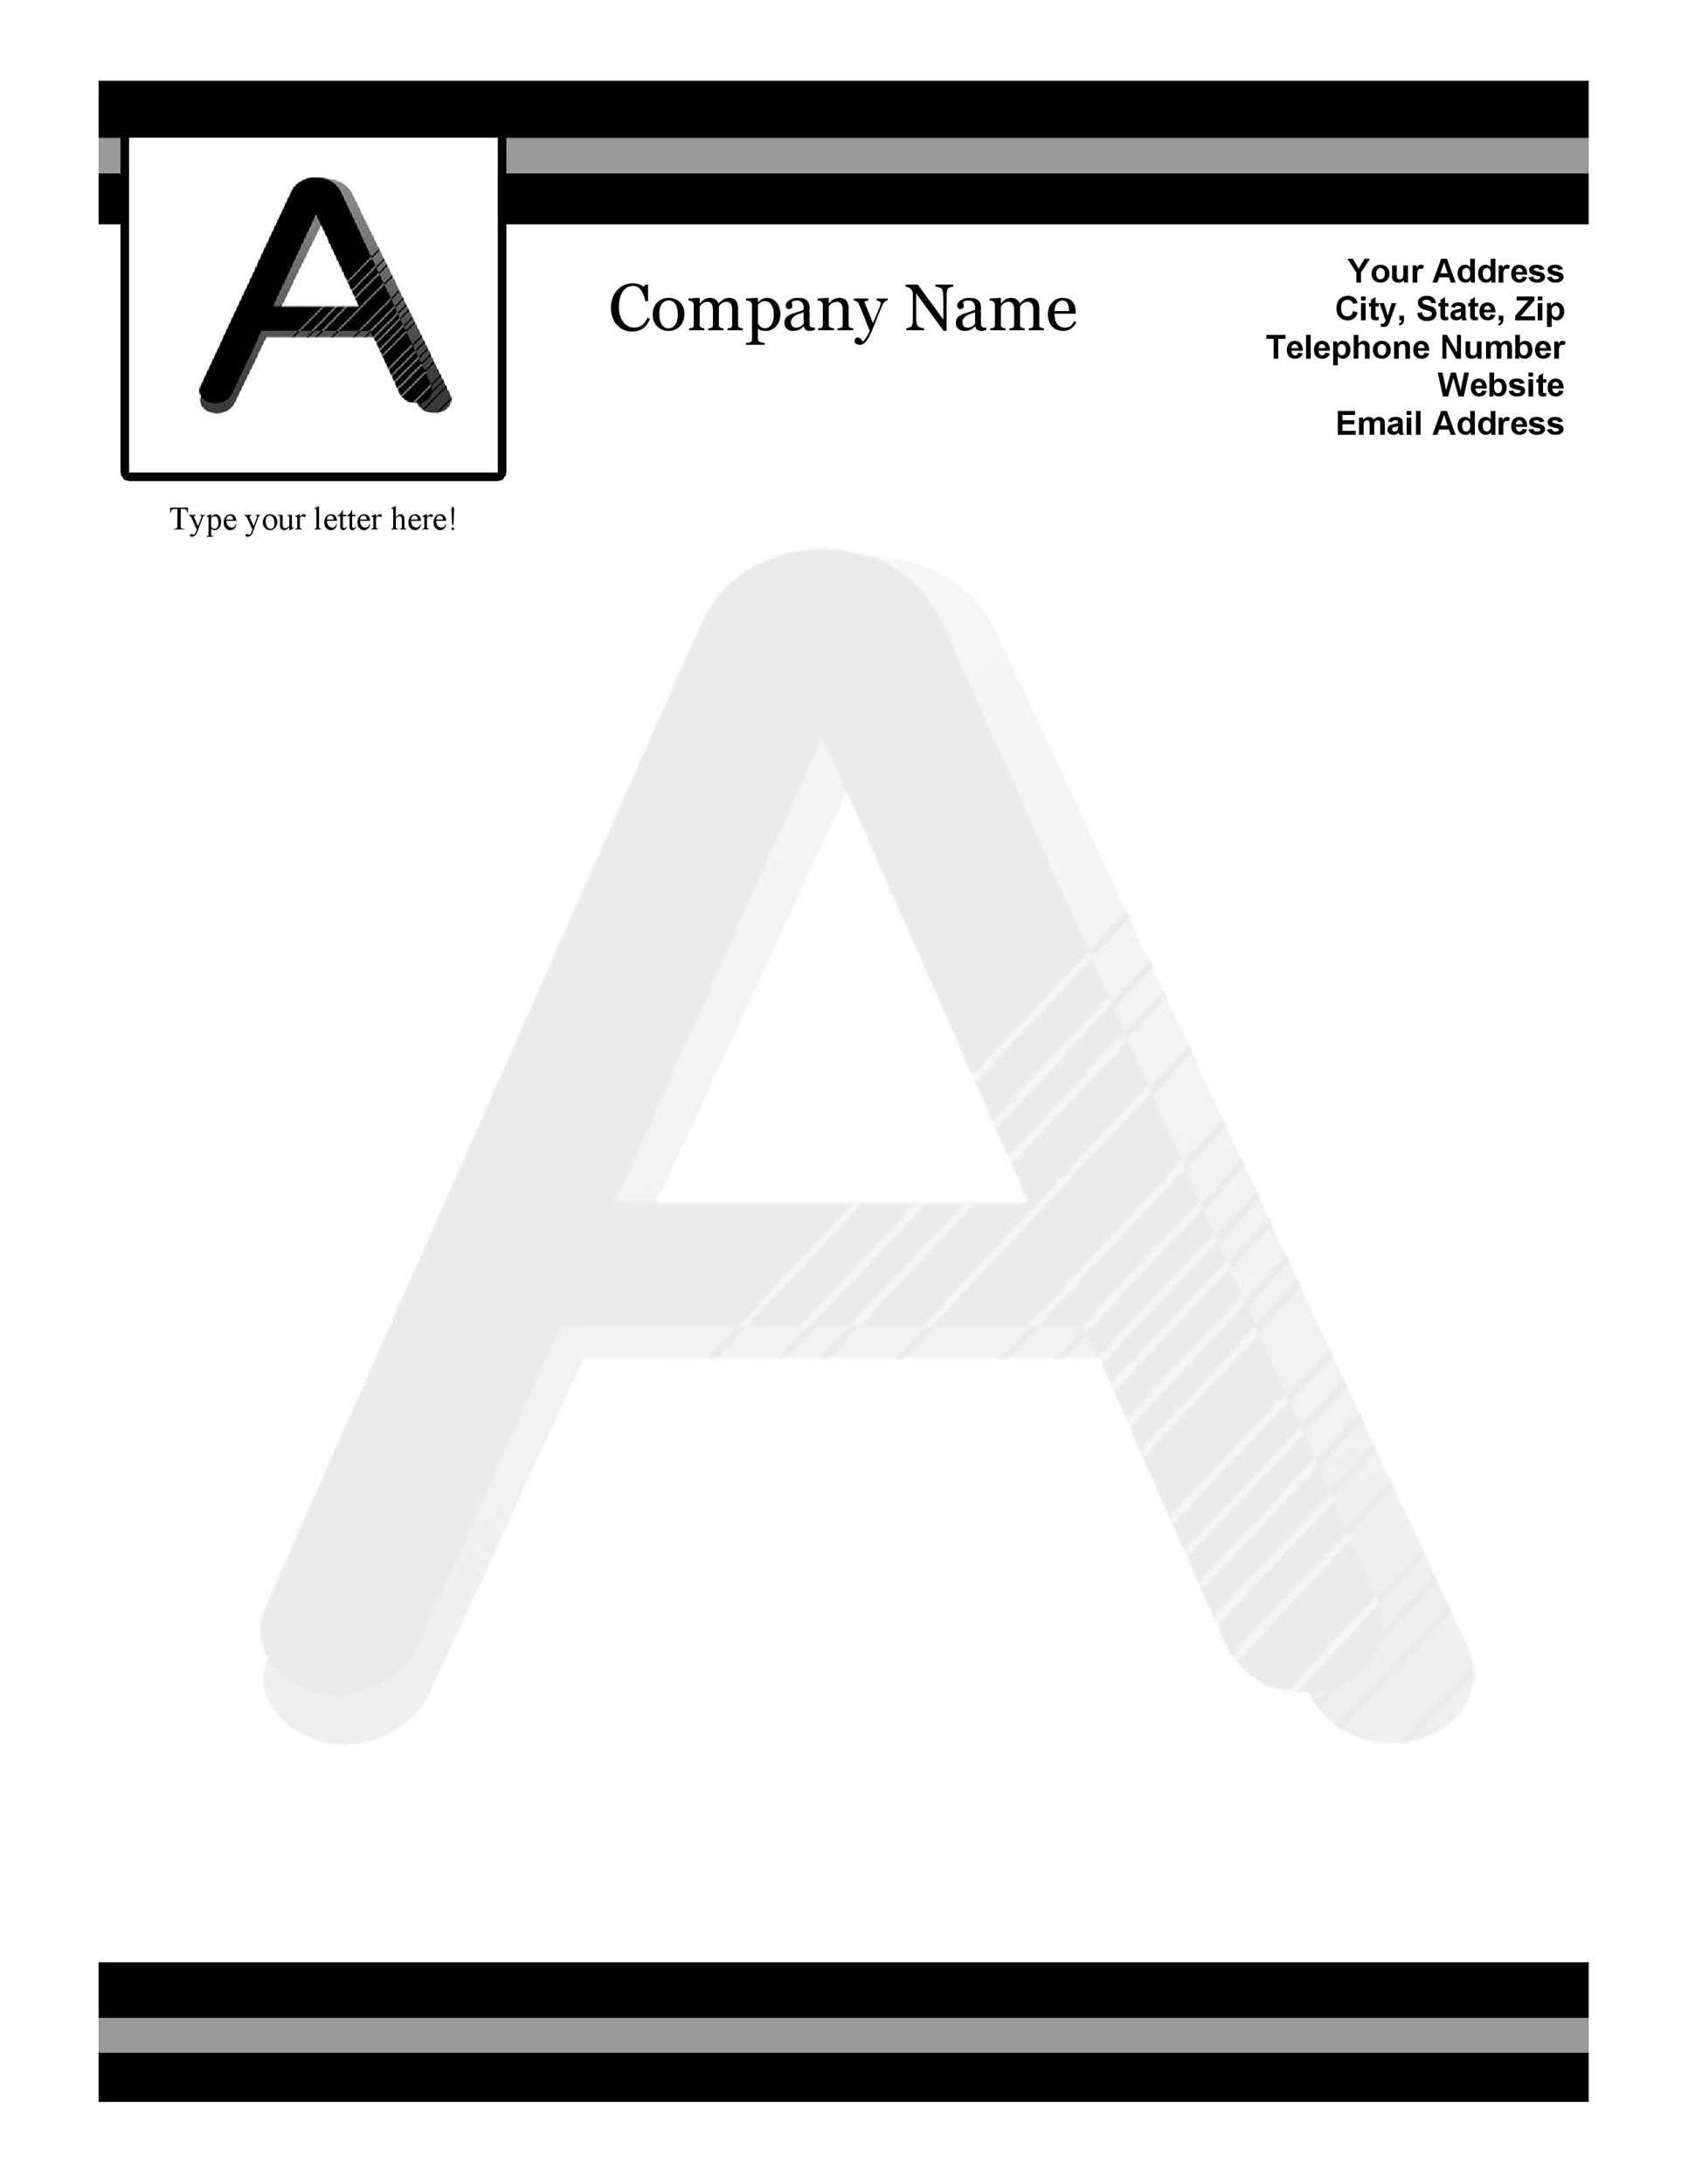 Free Letterhead Template 39